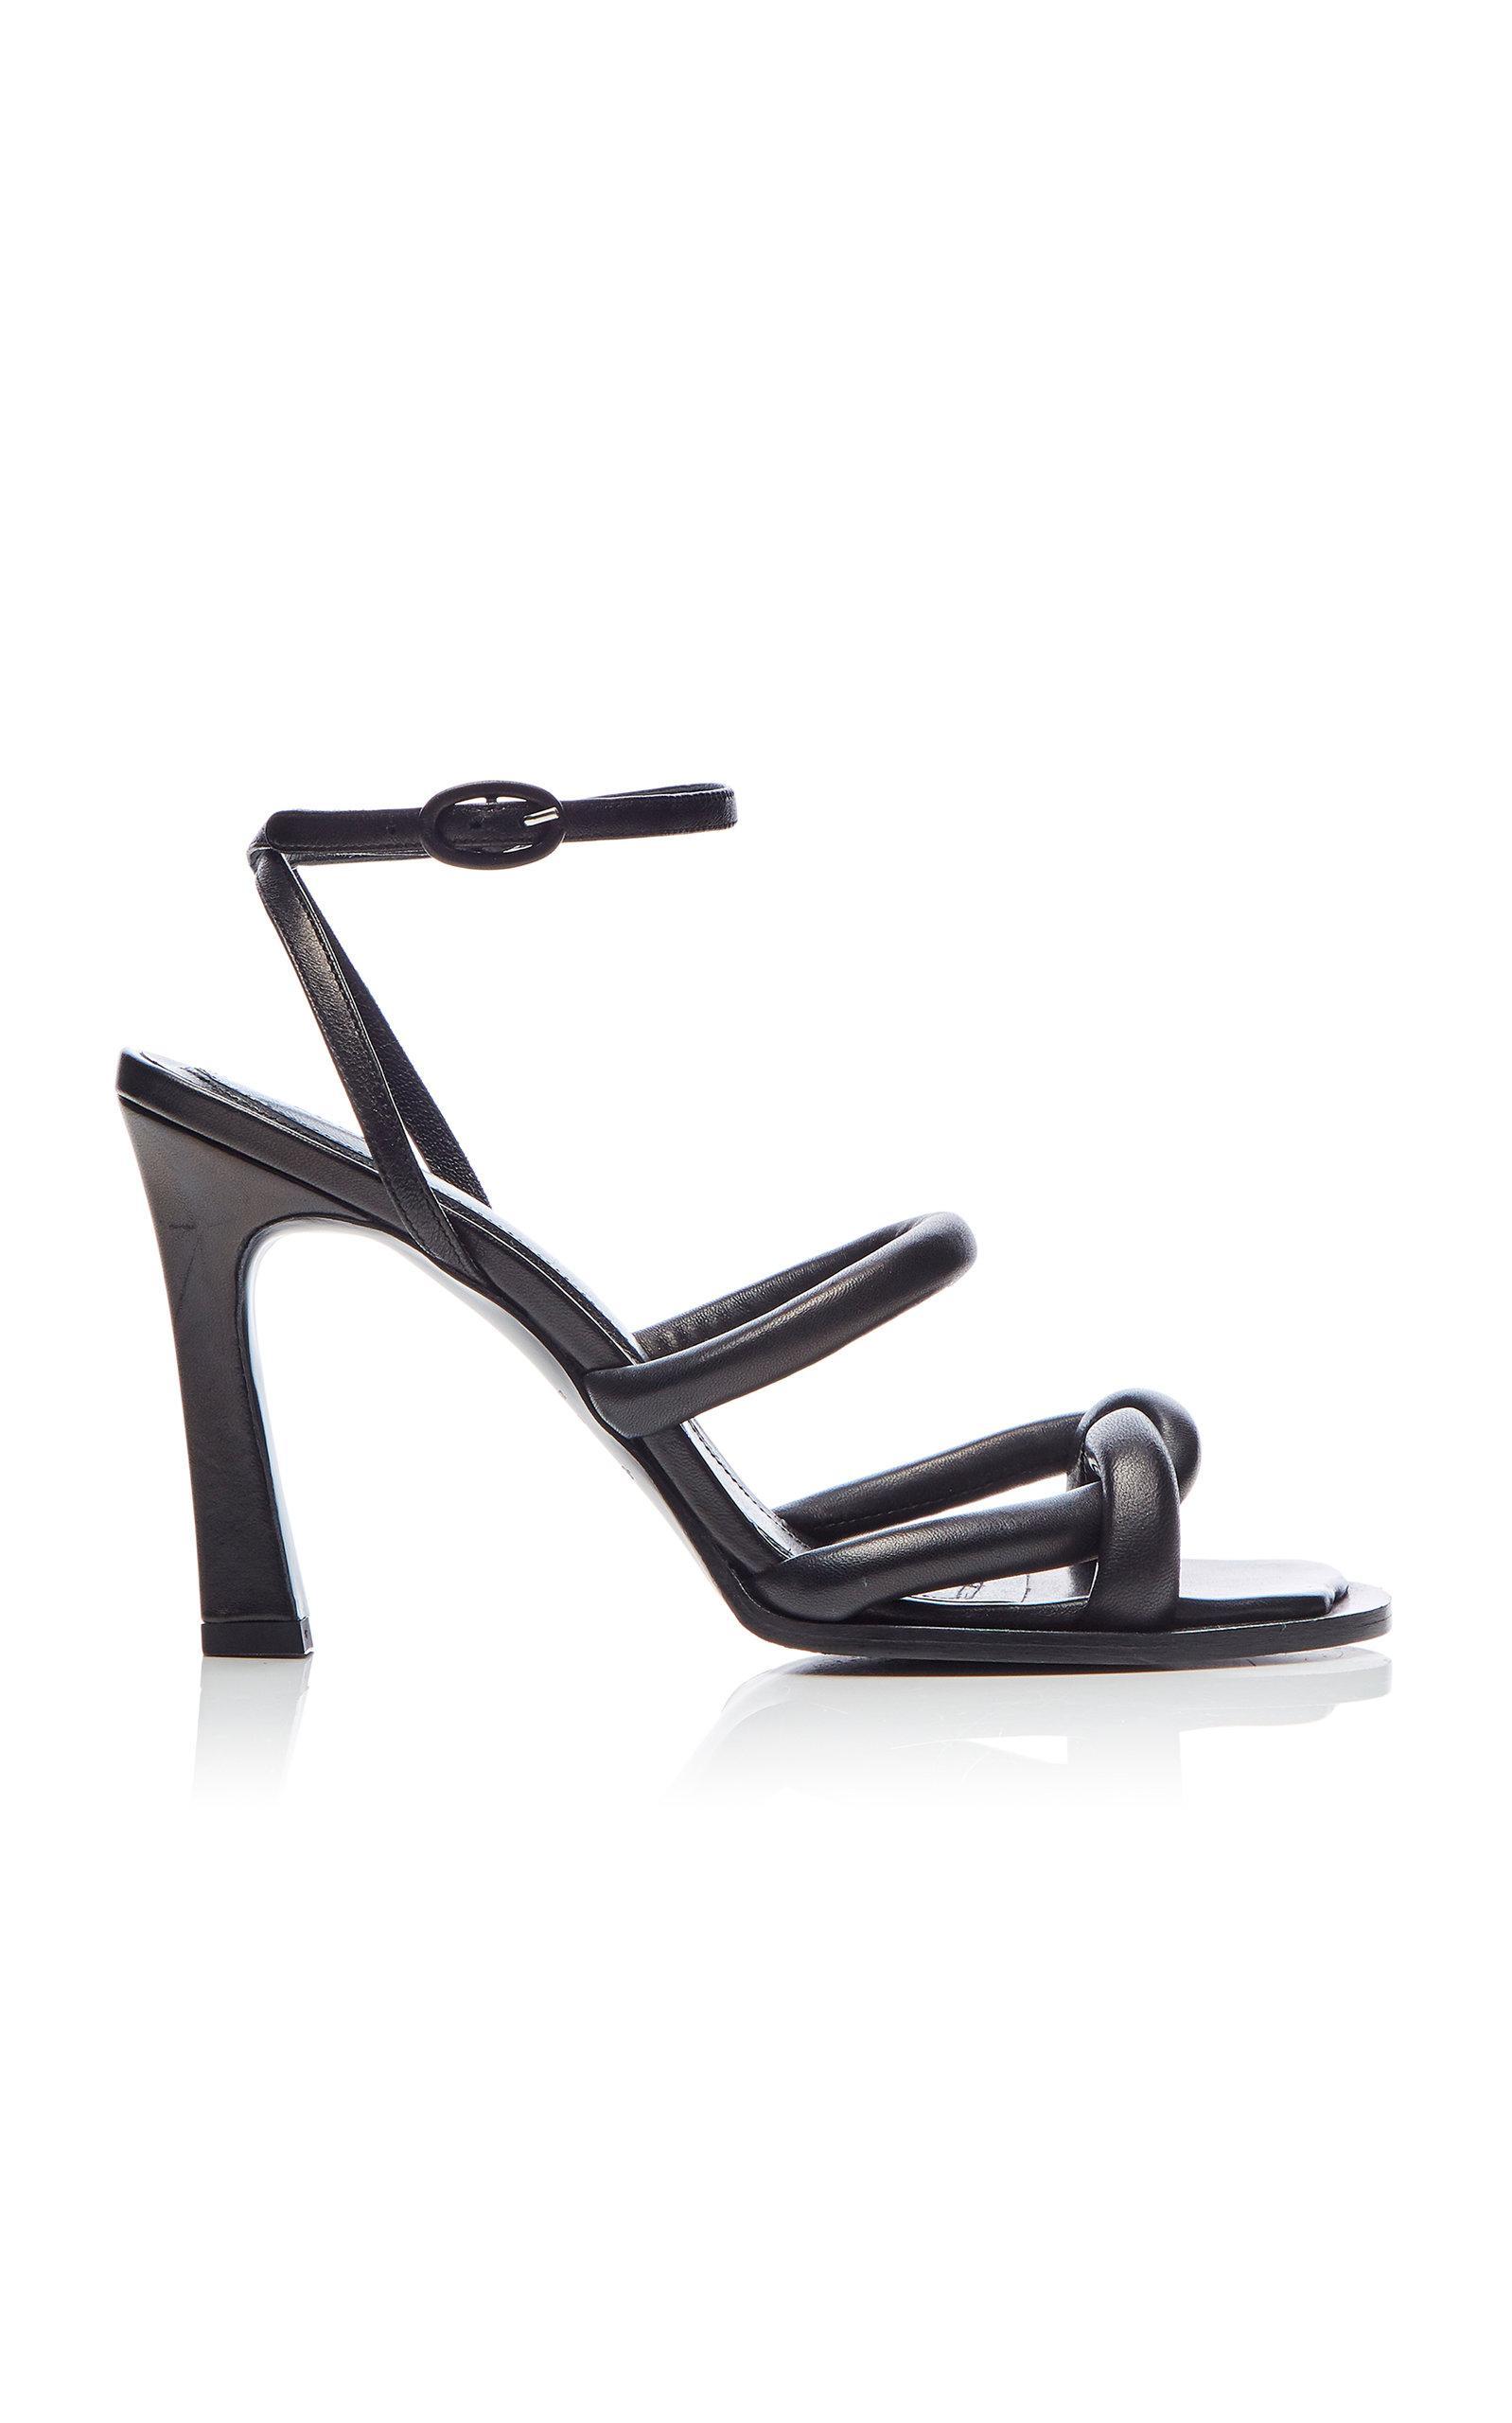 182630a726b Lyst - Ellery Distill Twisted Plain Leather Sandals in Black